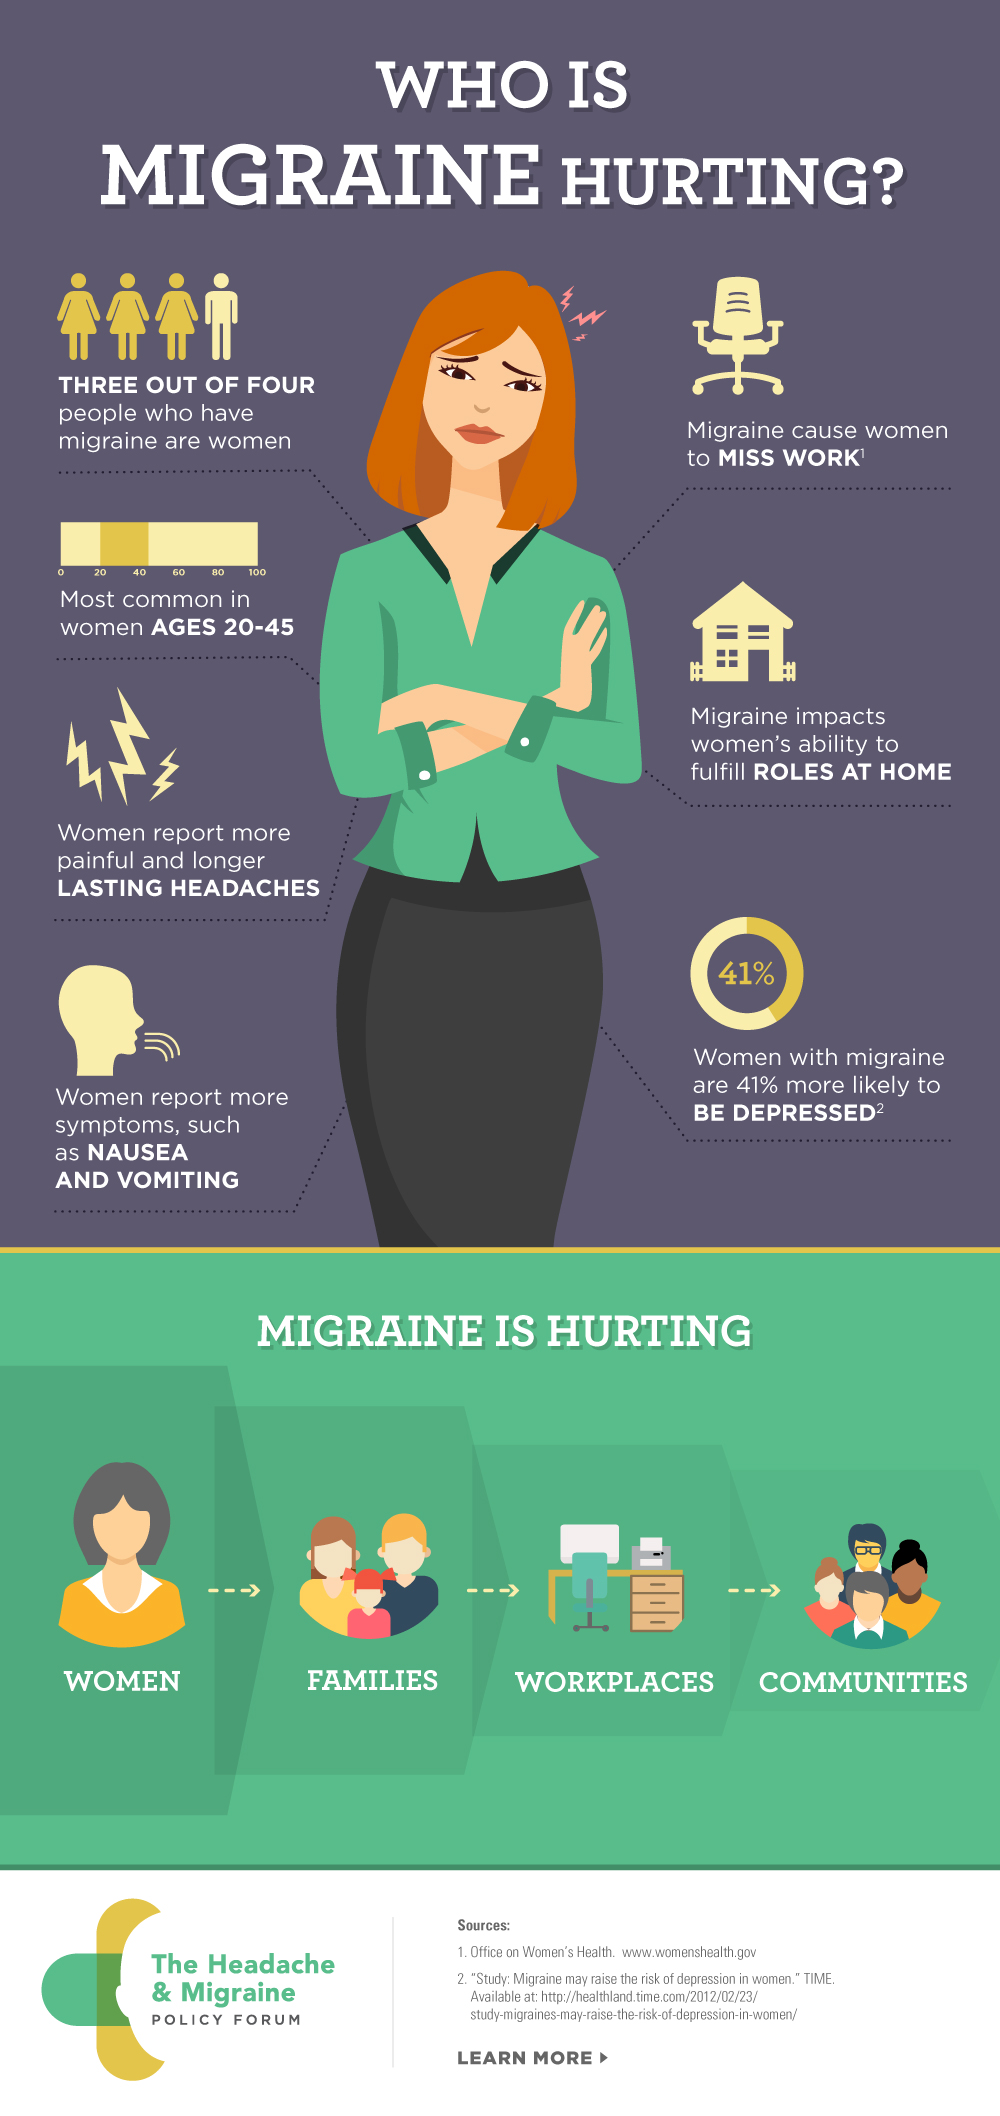 HMPF_Migraine_ImpactOnWomen_Infographic.jpg